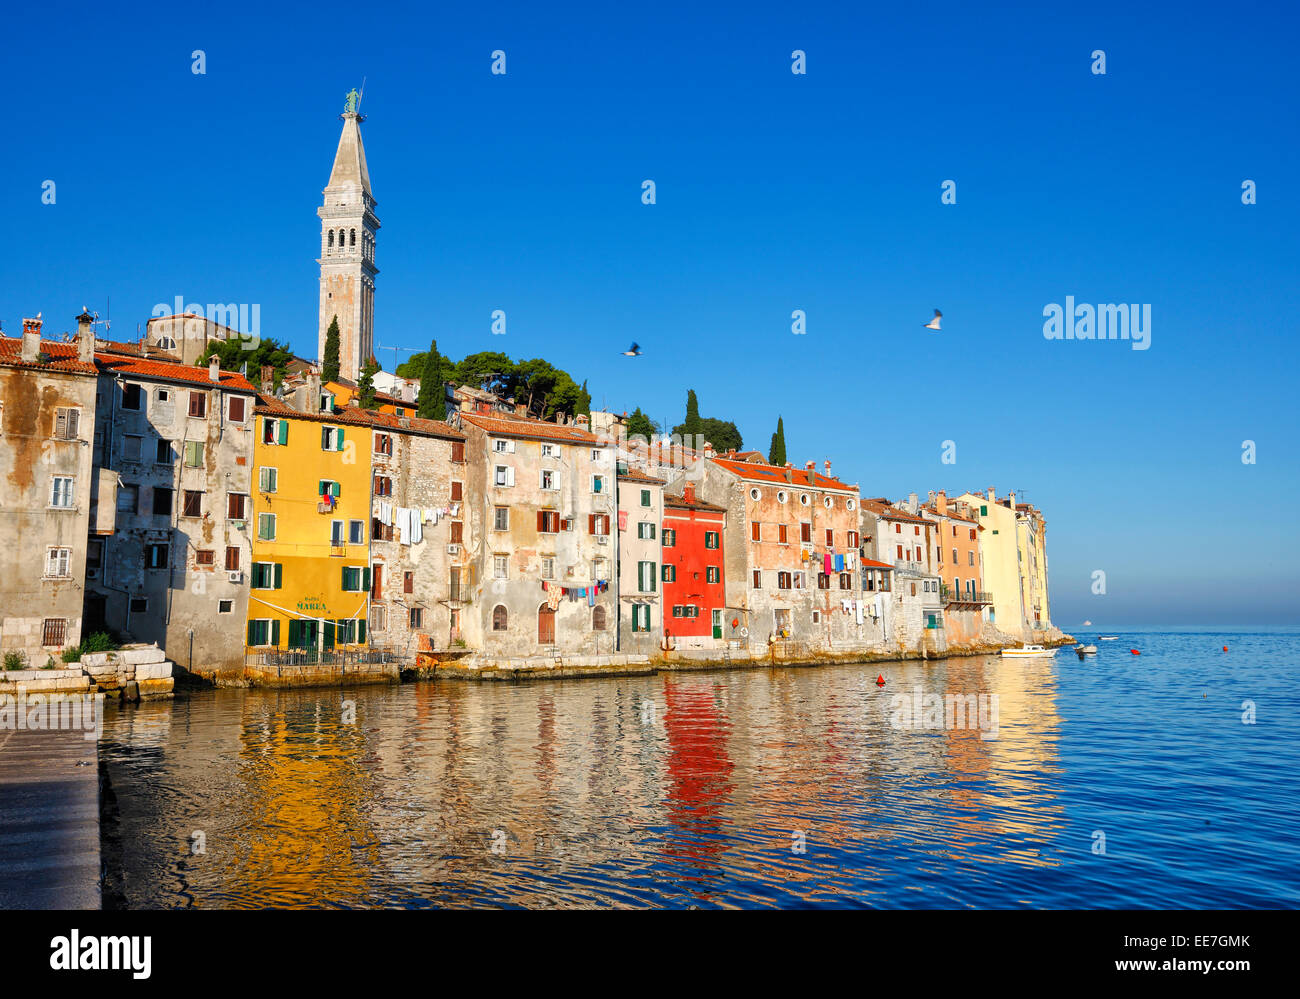 Casco antiguo de Rovinj en Istria, Croacia. Imagen De Stock